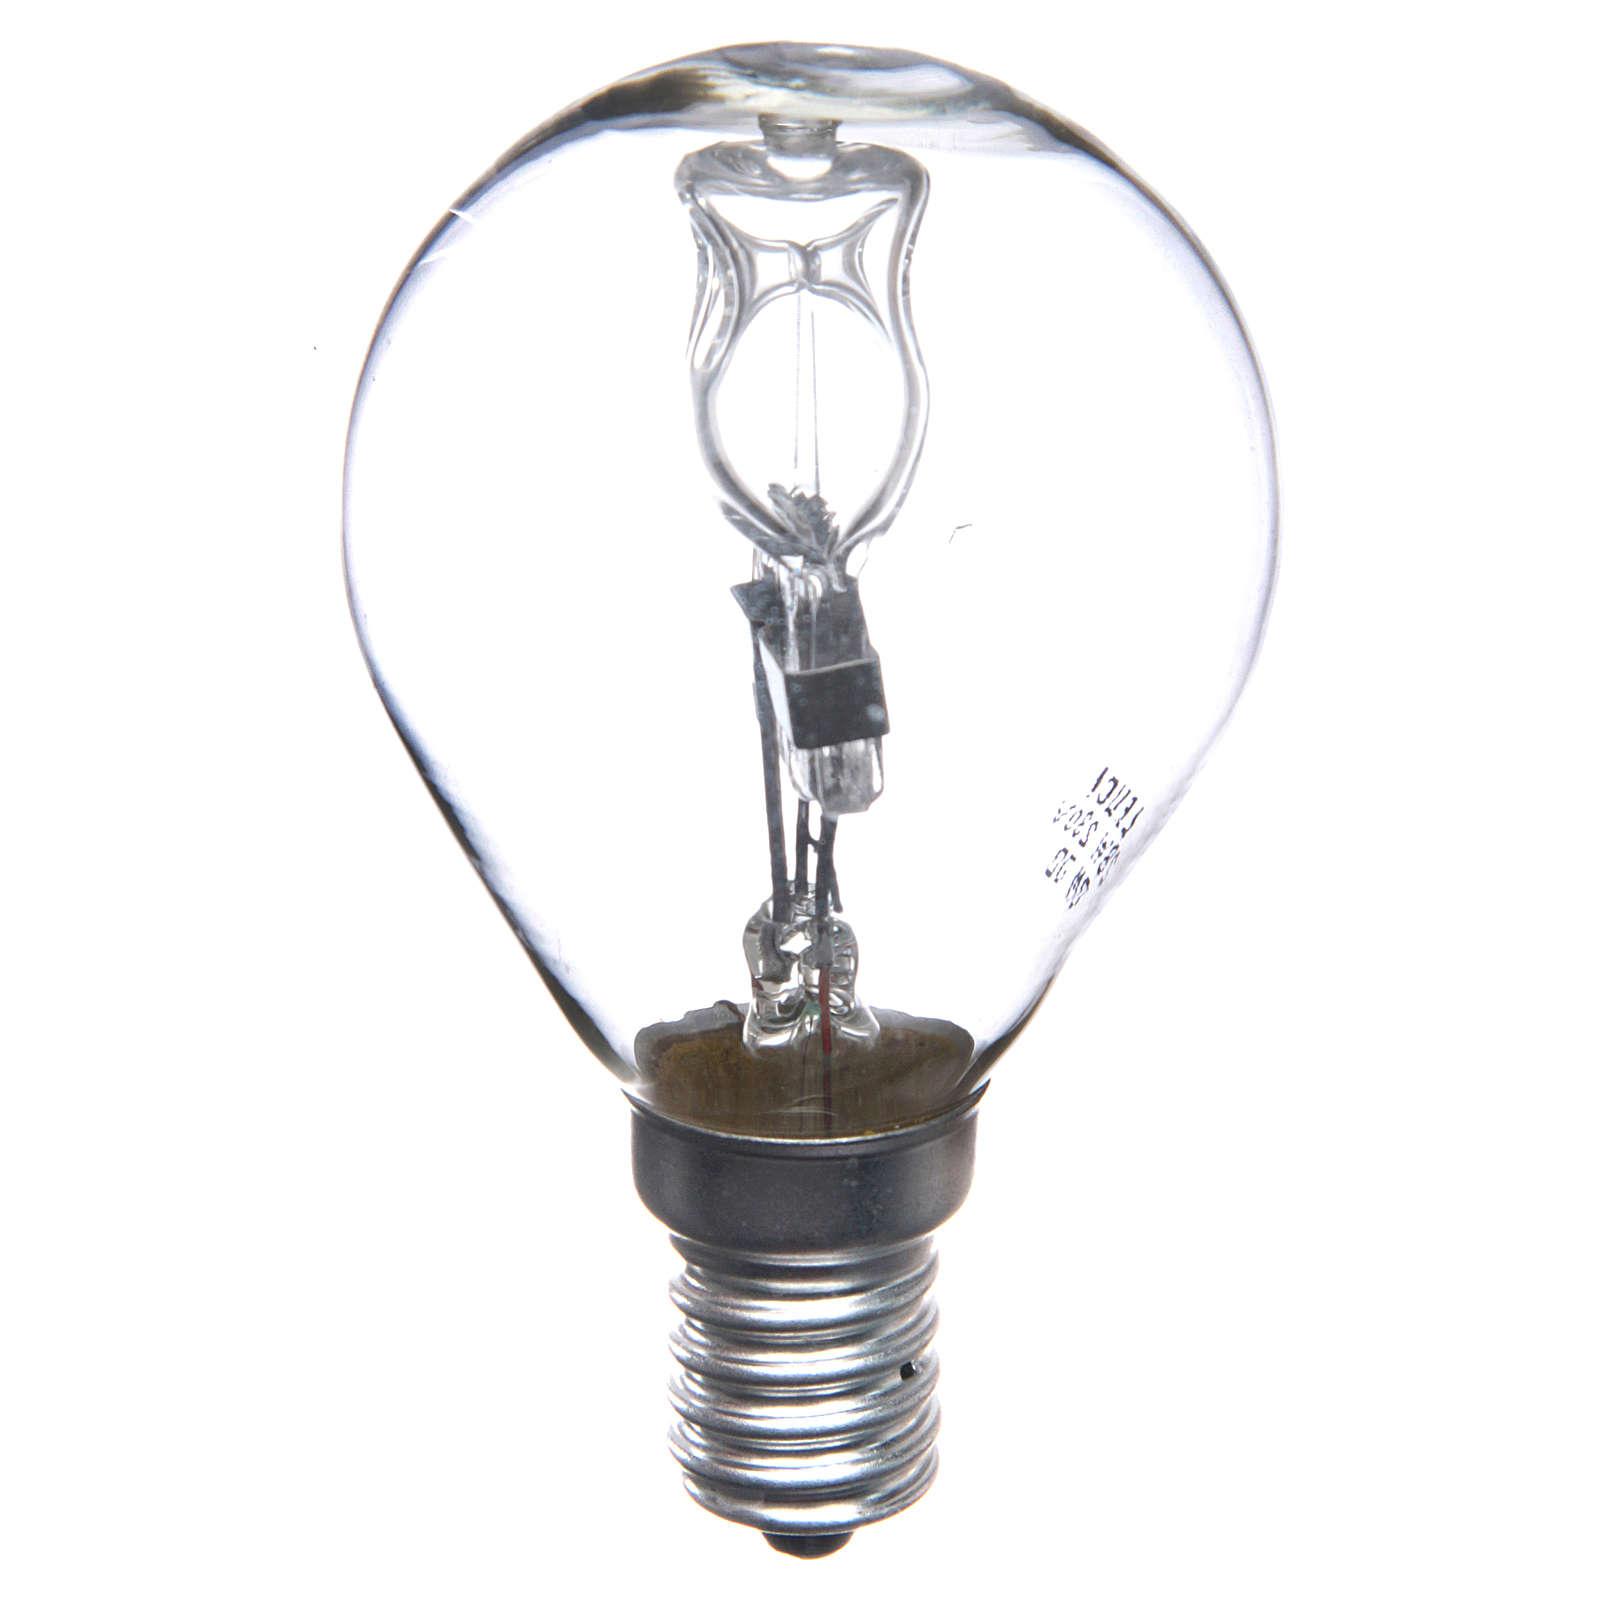 Ampoule 25W E14 blanc illumination crèche noël 4